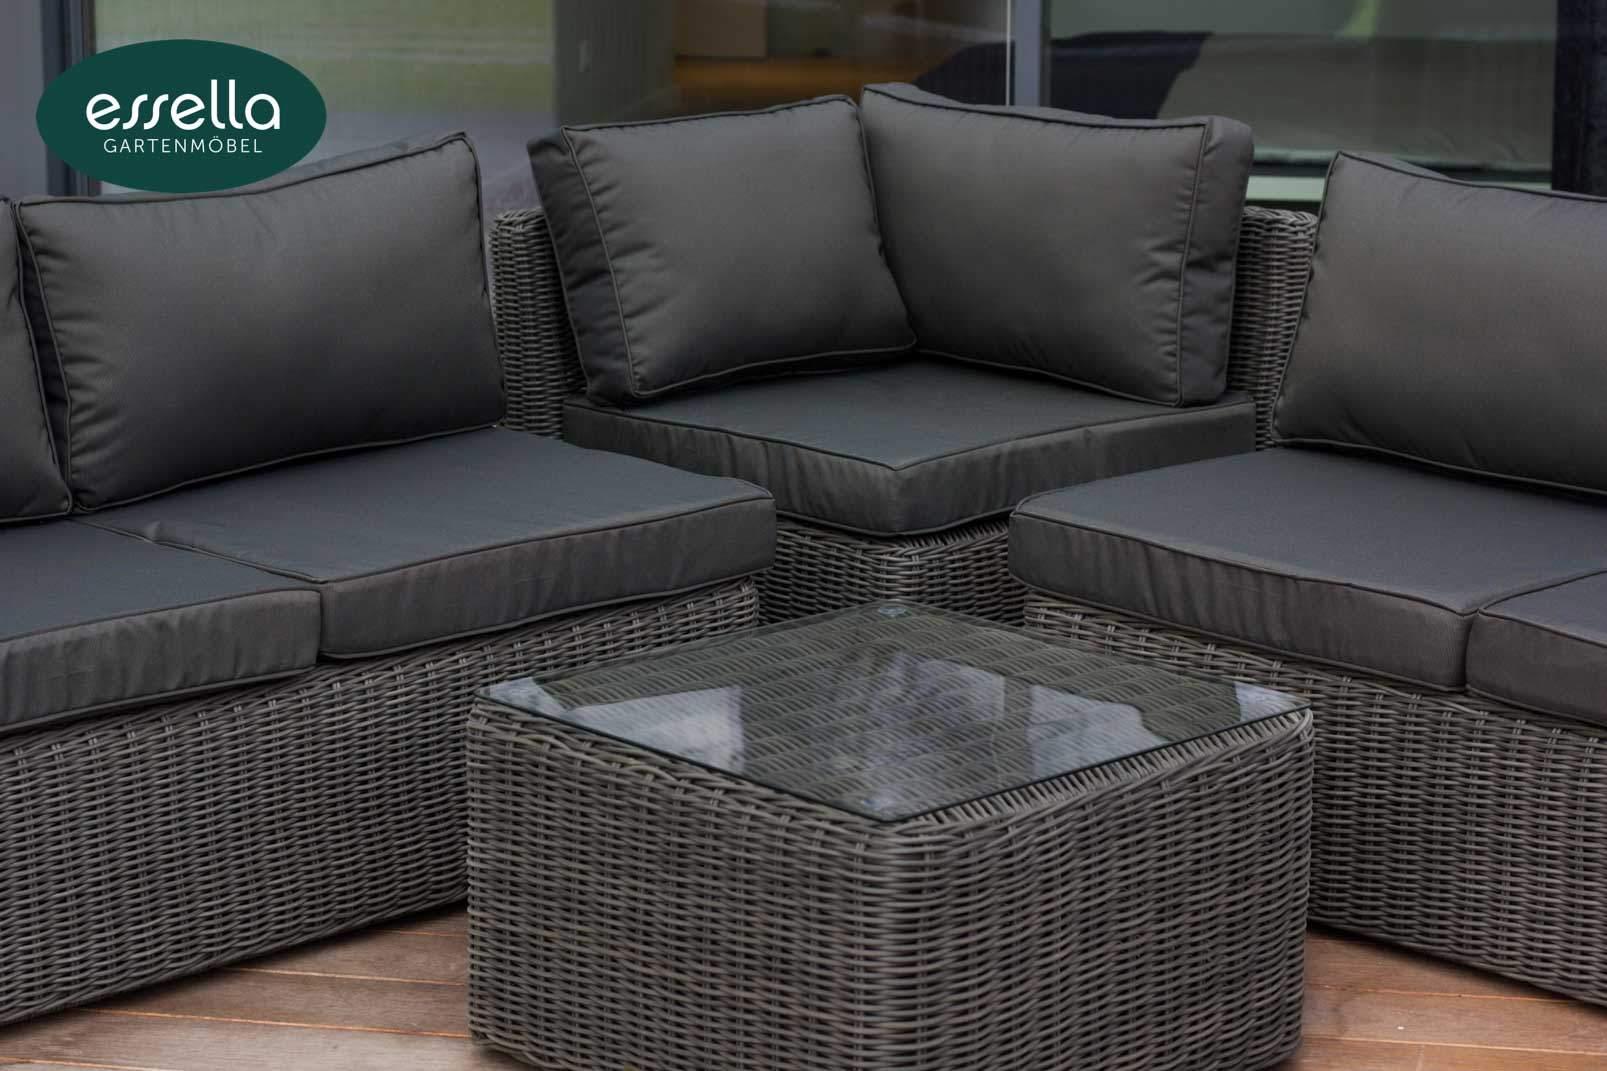 essella polyrattan loungemoebel sitzgruppe oslo grau rundgeflecht 5